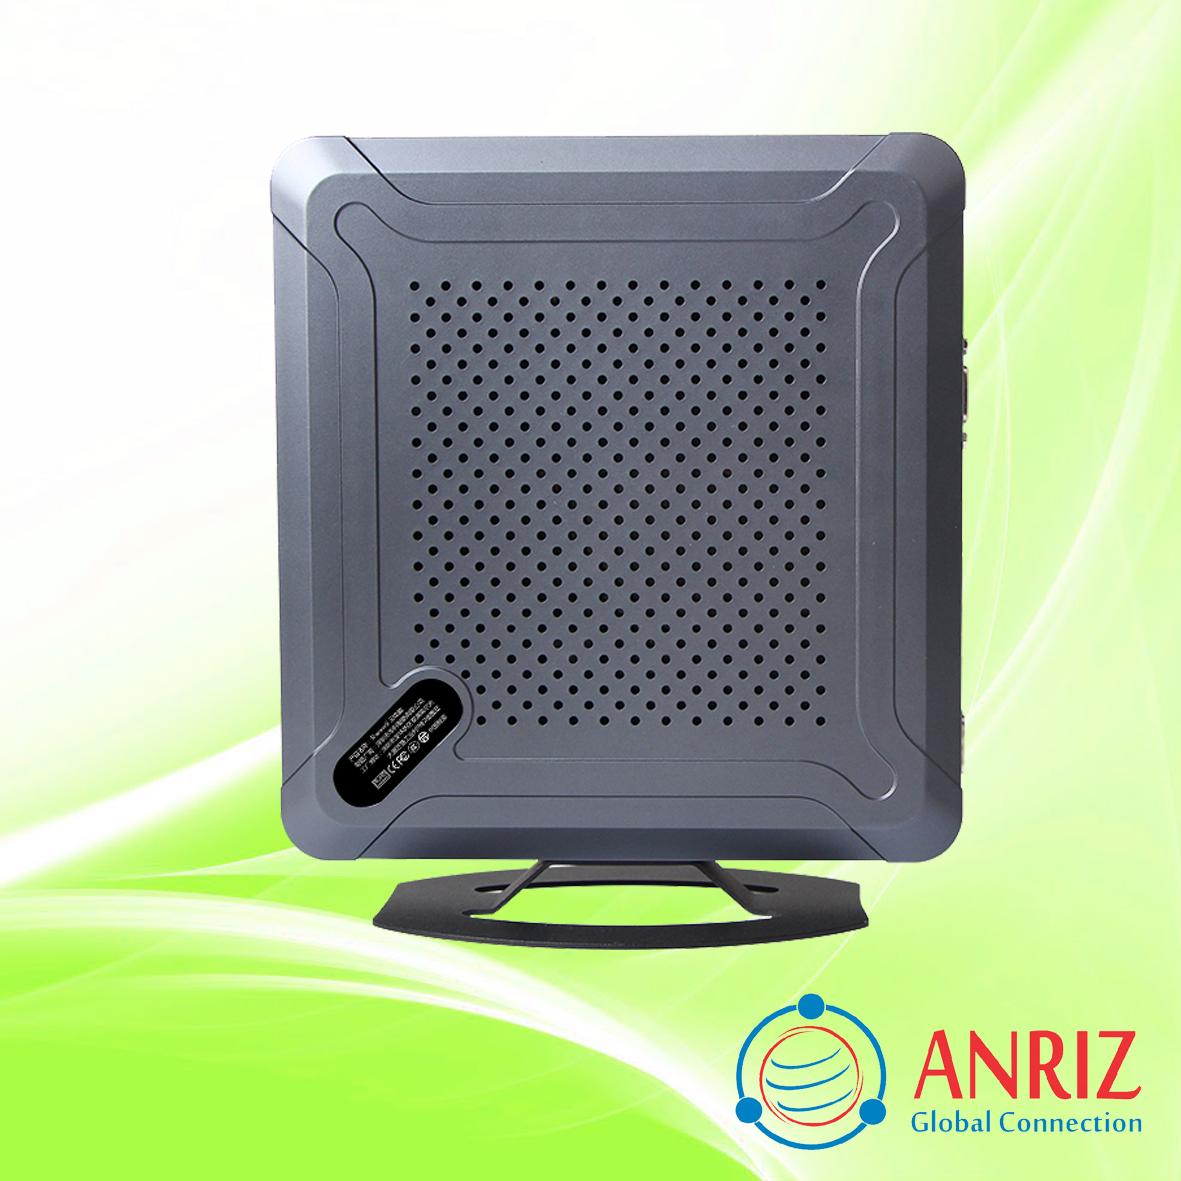 Mini PC IJOTECH AGC 3800 Quad Core